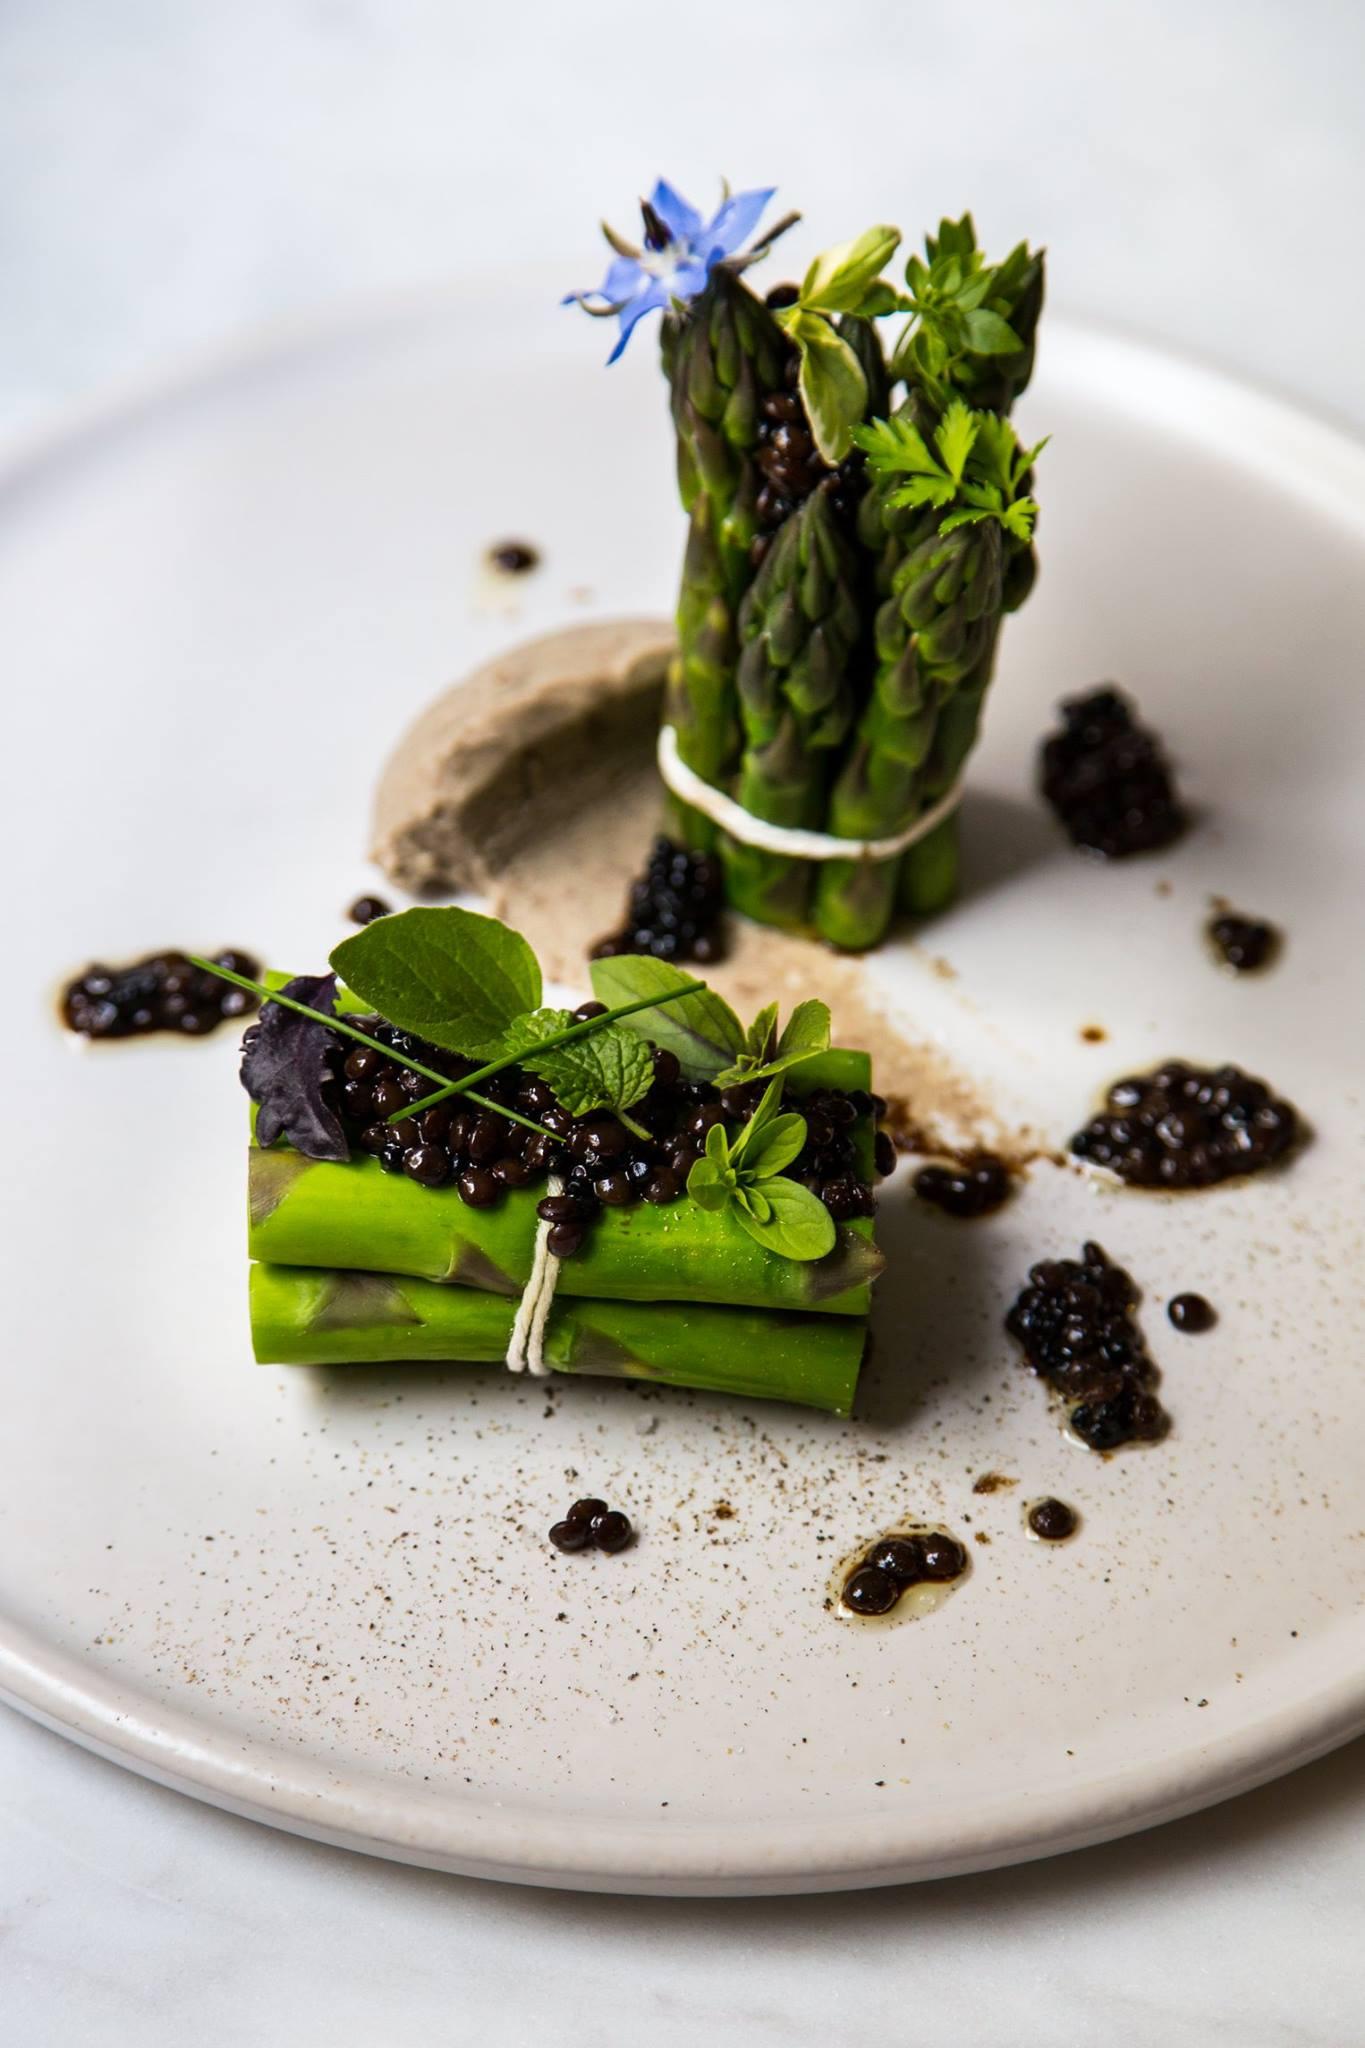 Asparagus, Cirkus style